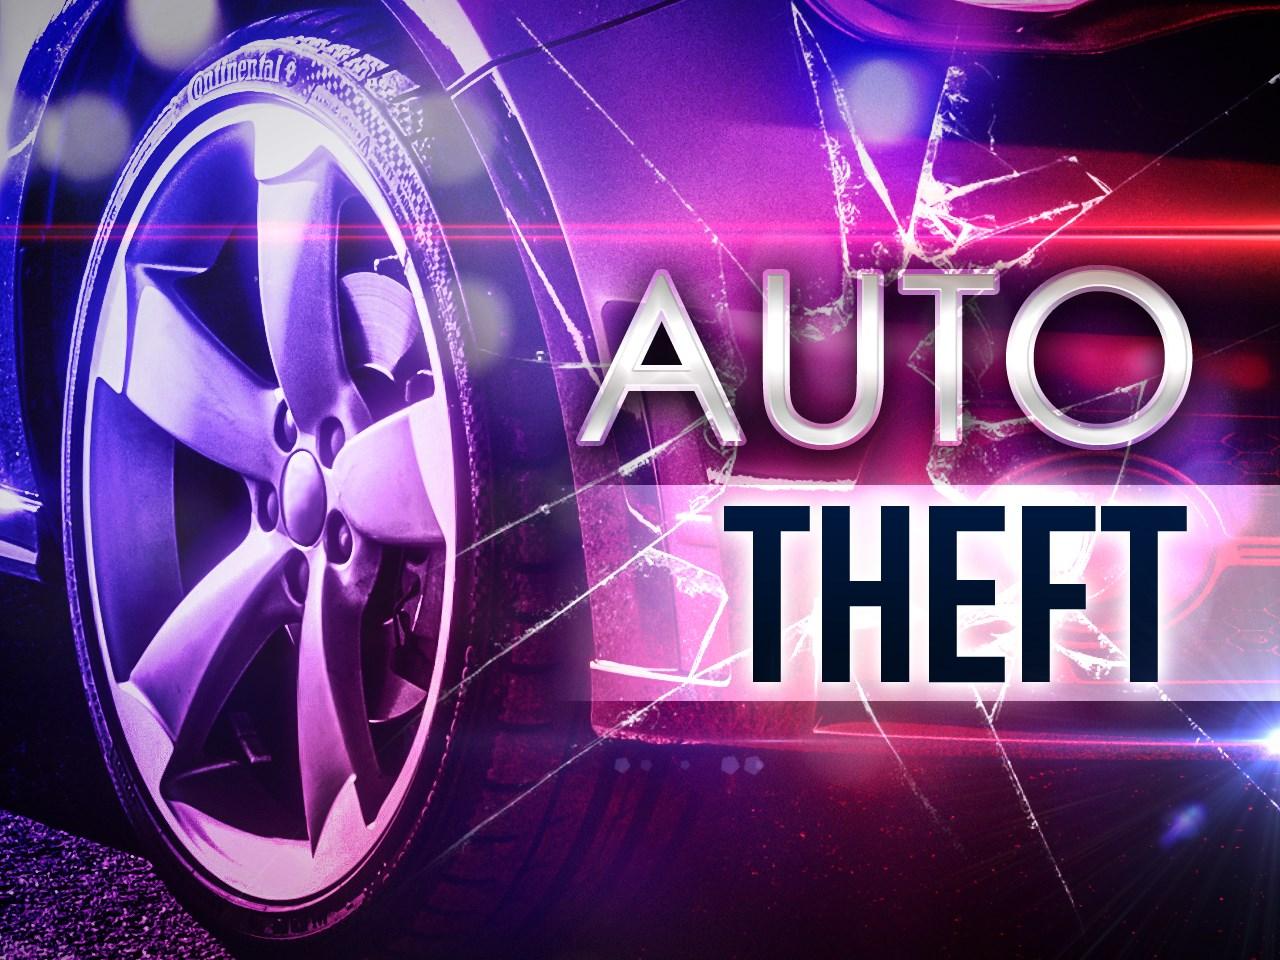 UPDATE: Police Locate Stolen Truck, Juvenile in Custody